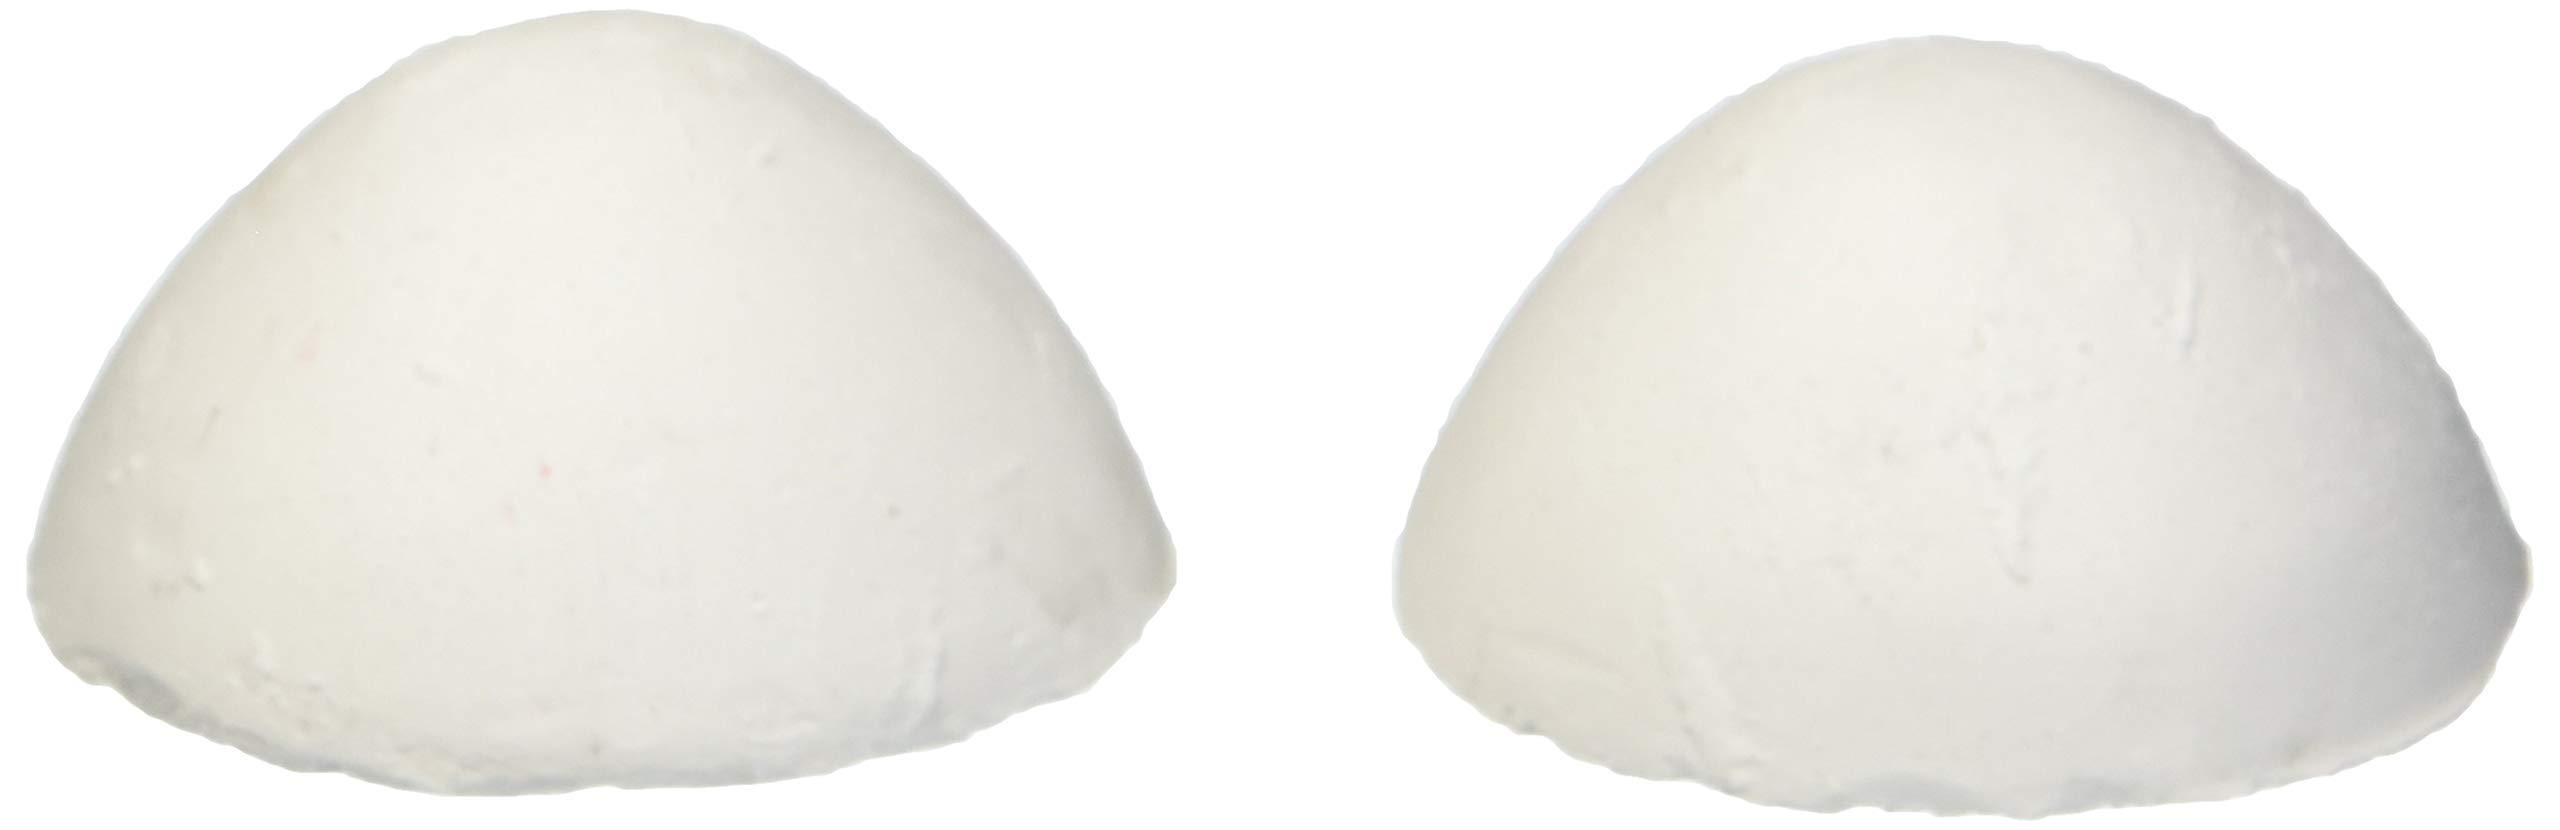 CH Hanson 10395 White Half Moon Carpenter Chalk (72 Pack)